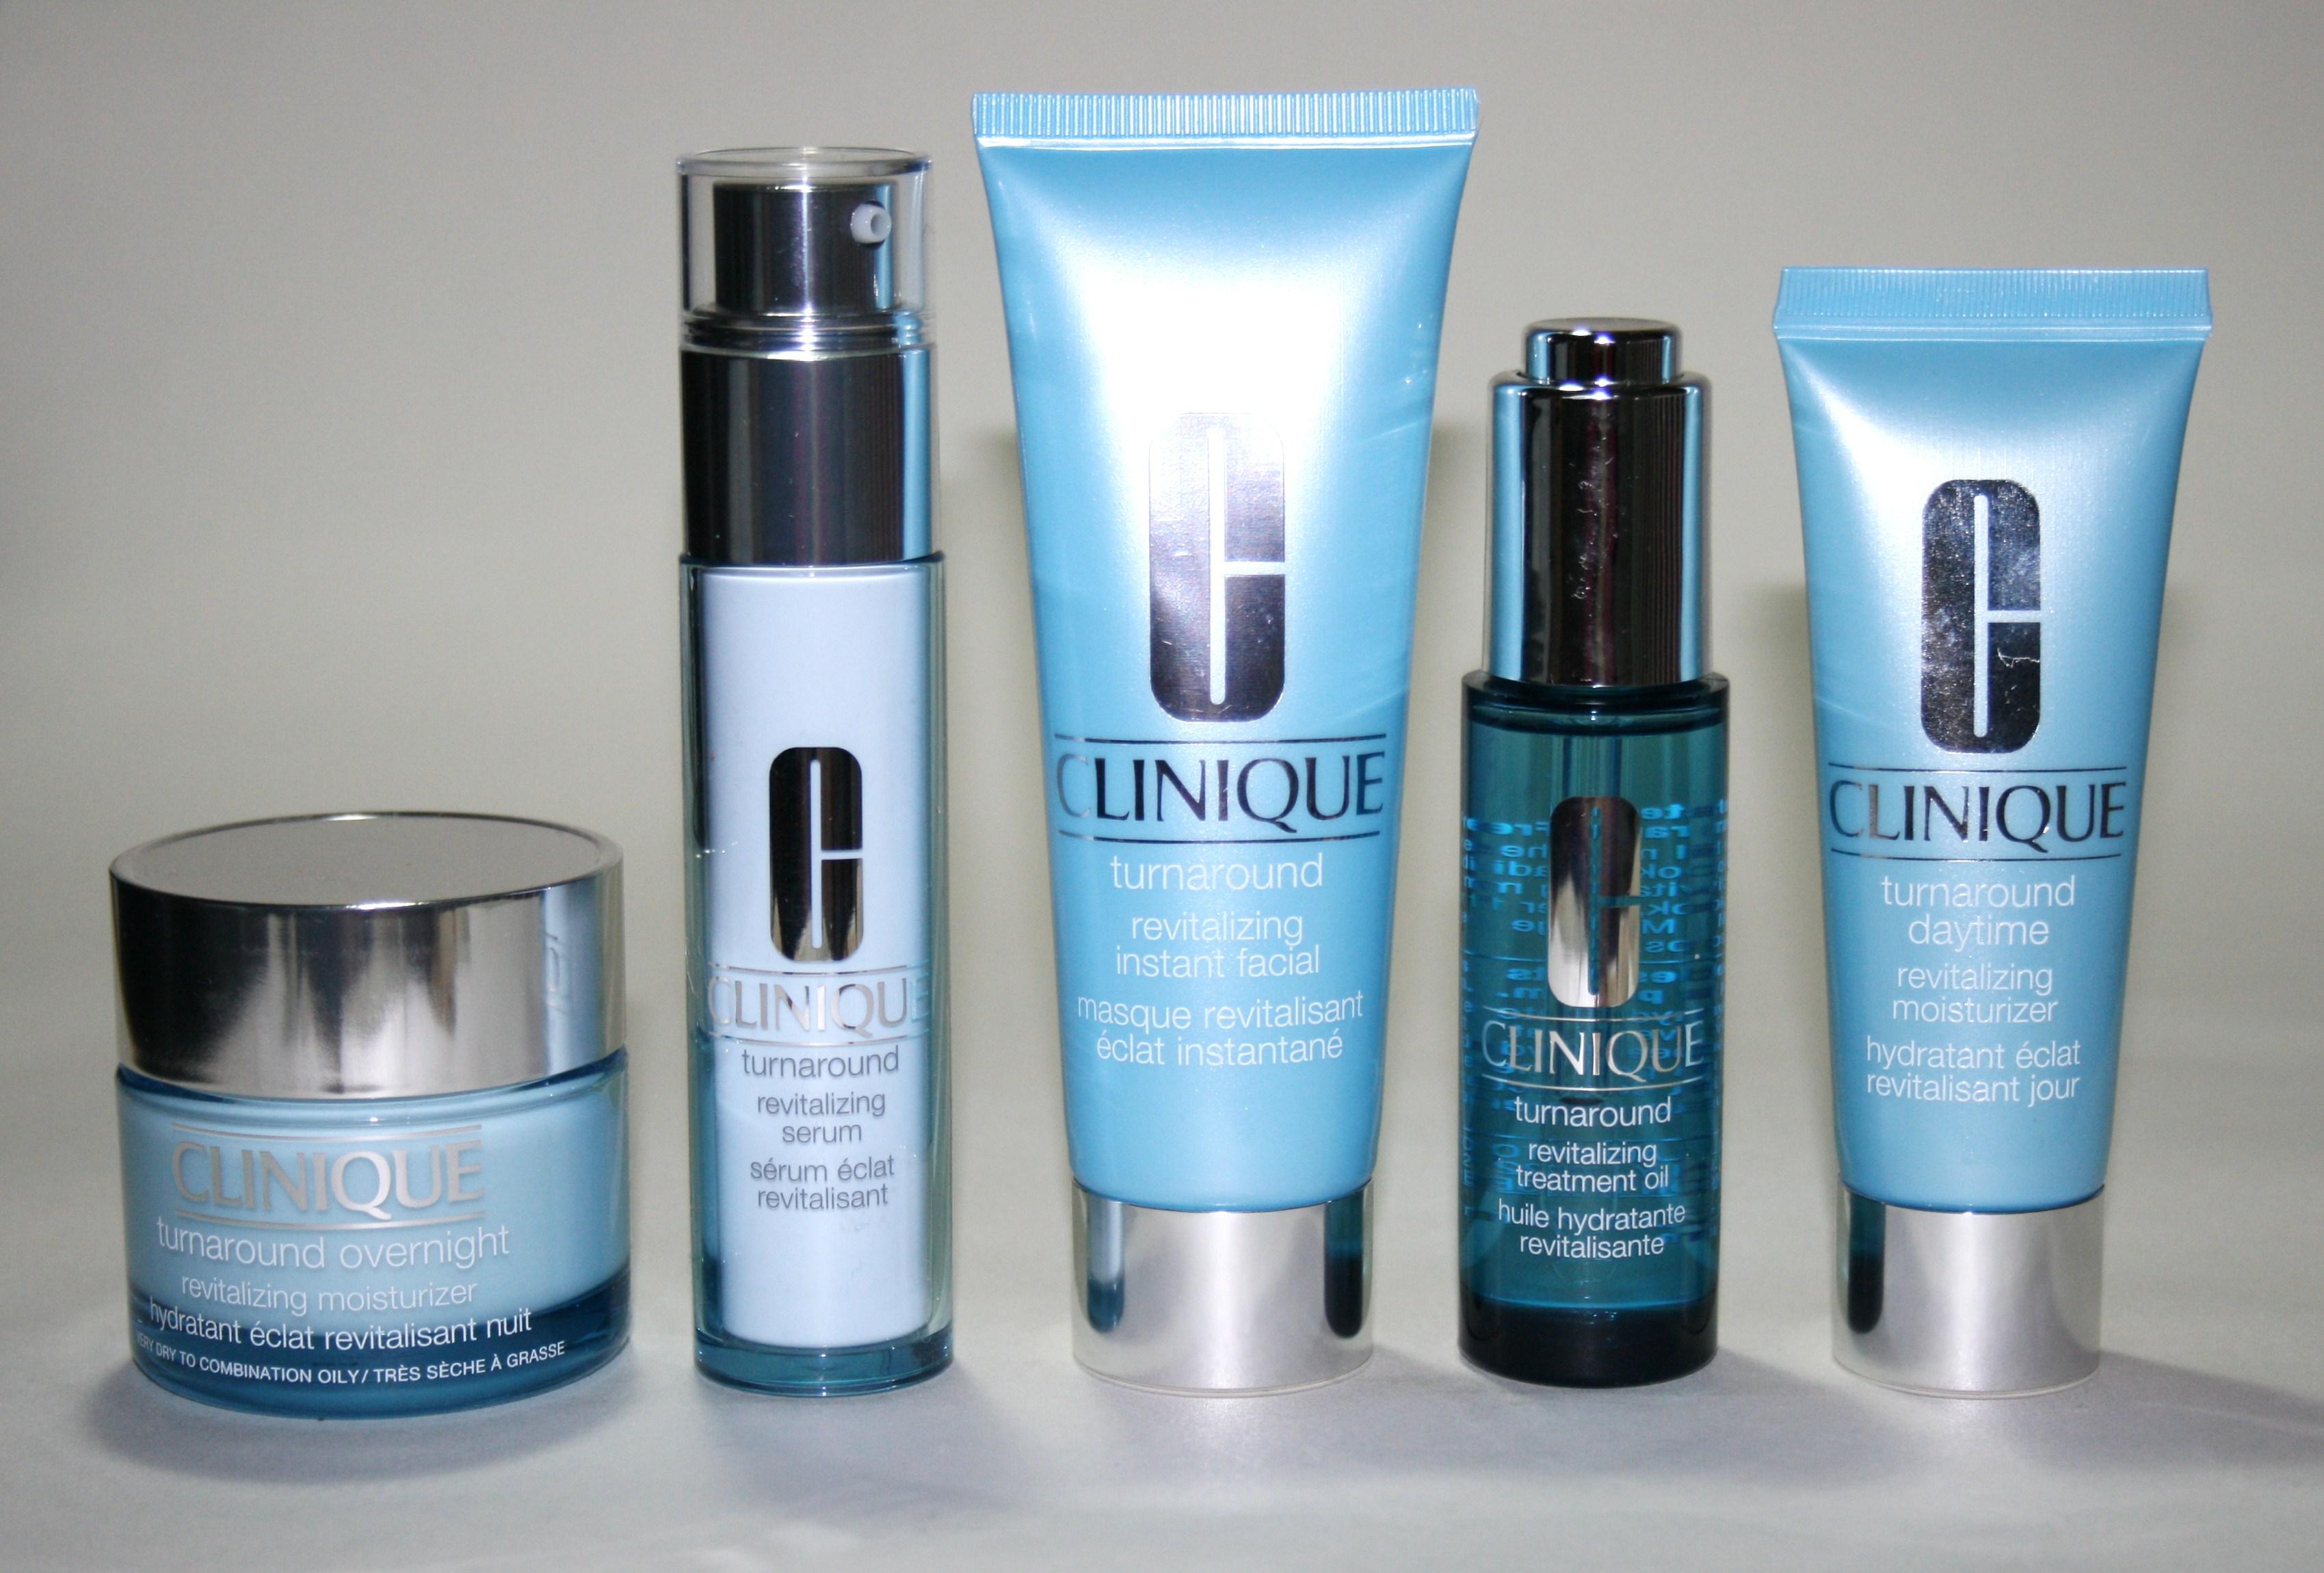 Clinique Turnaround Skincare Range - Beauty Geek UK